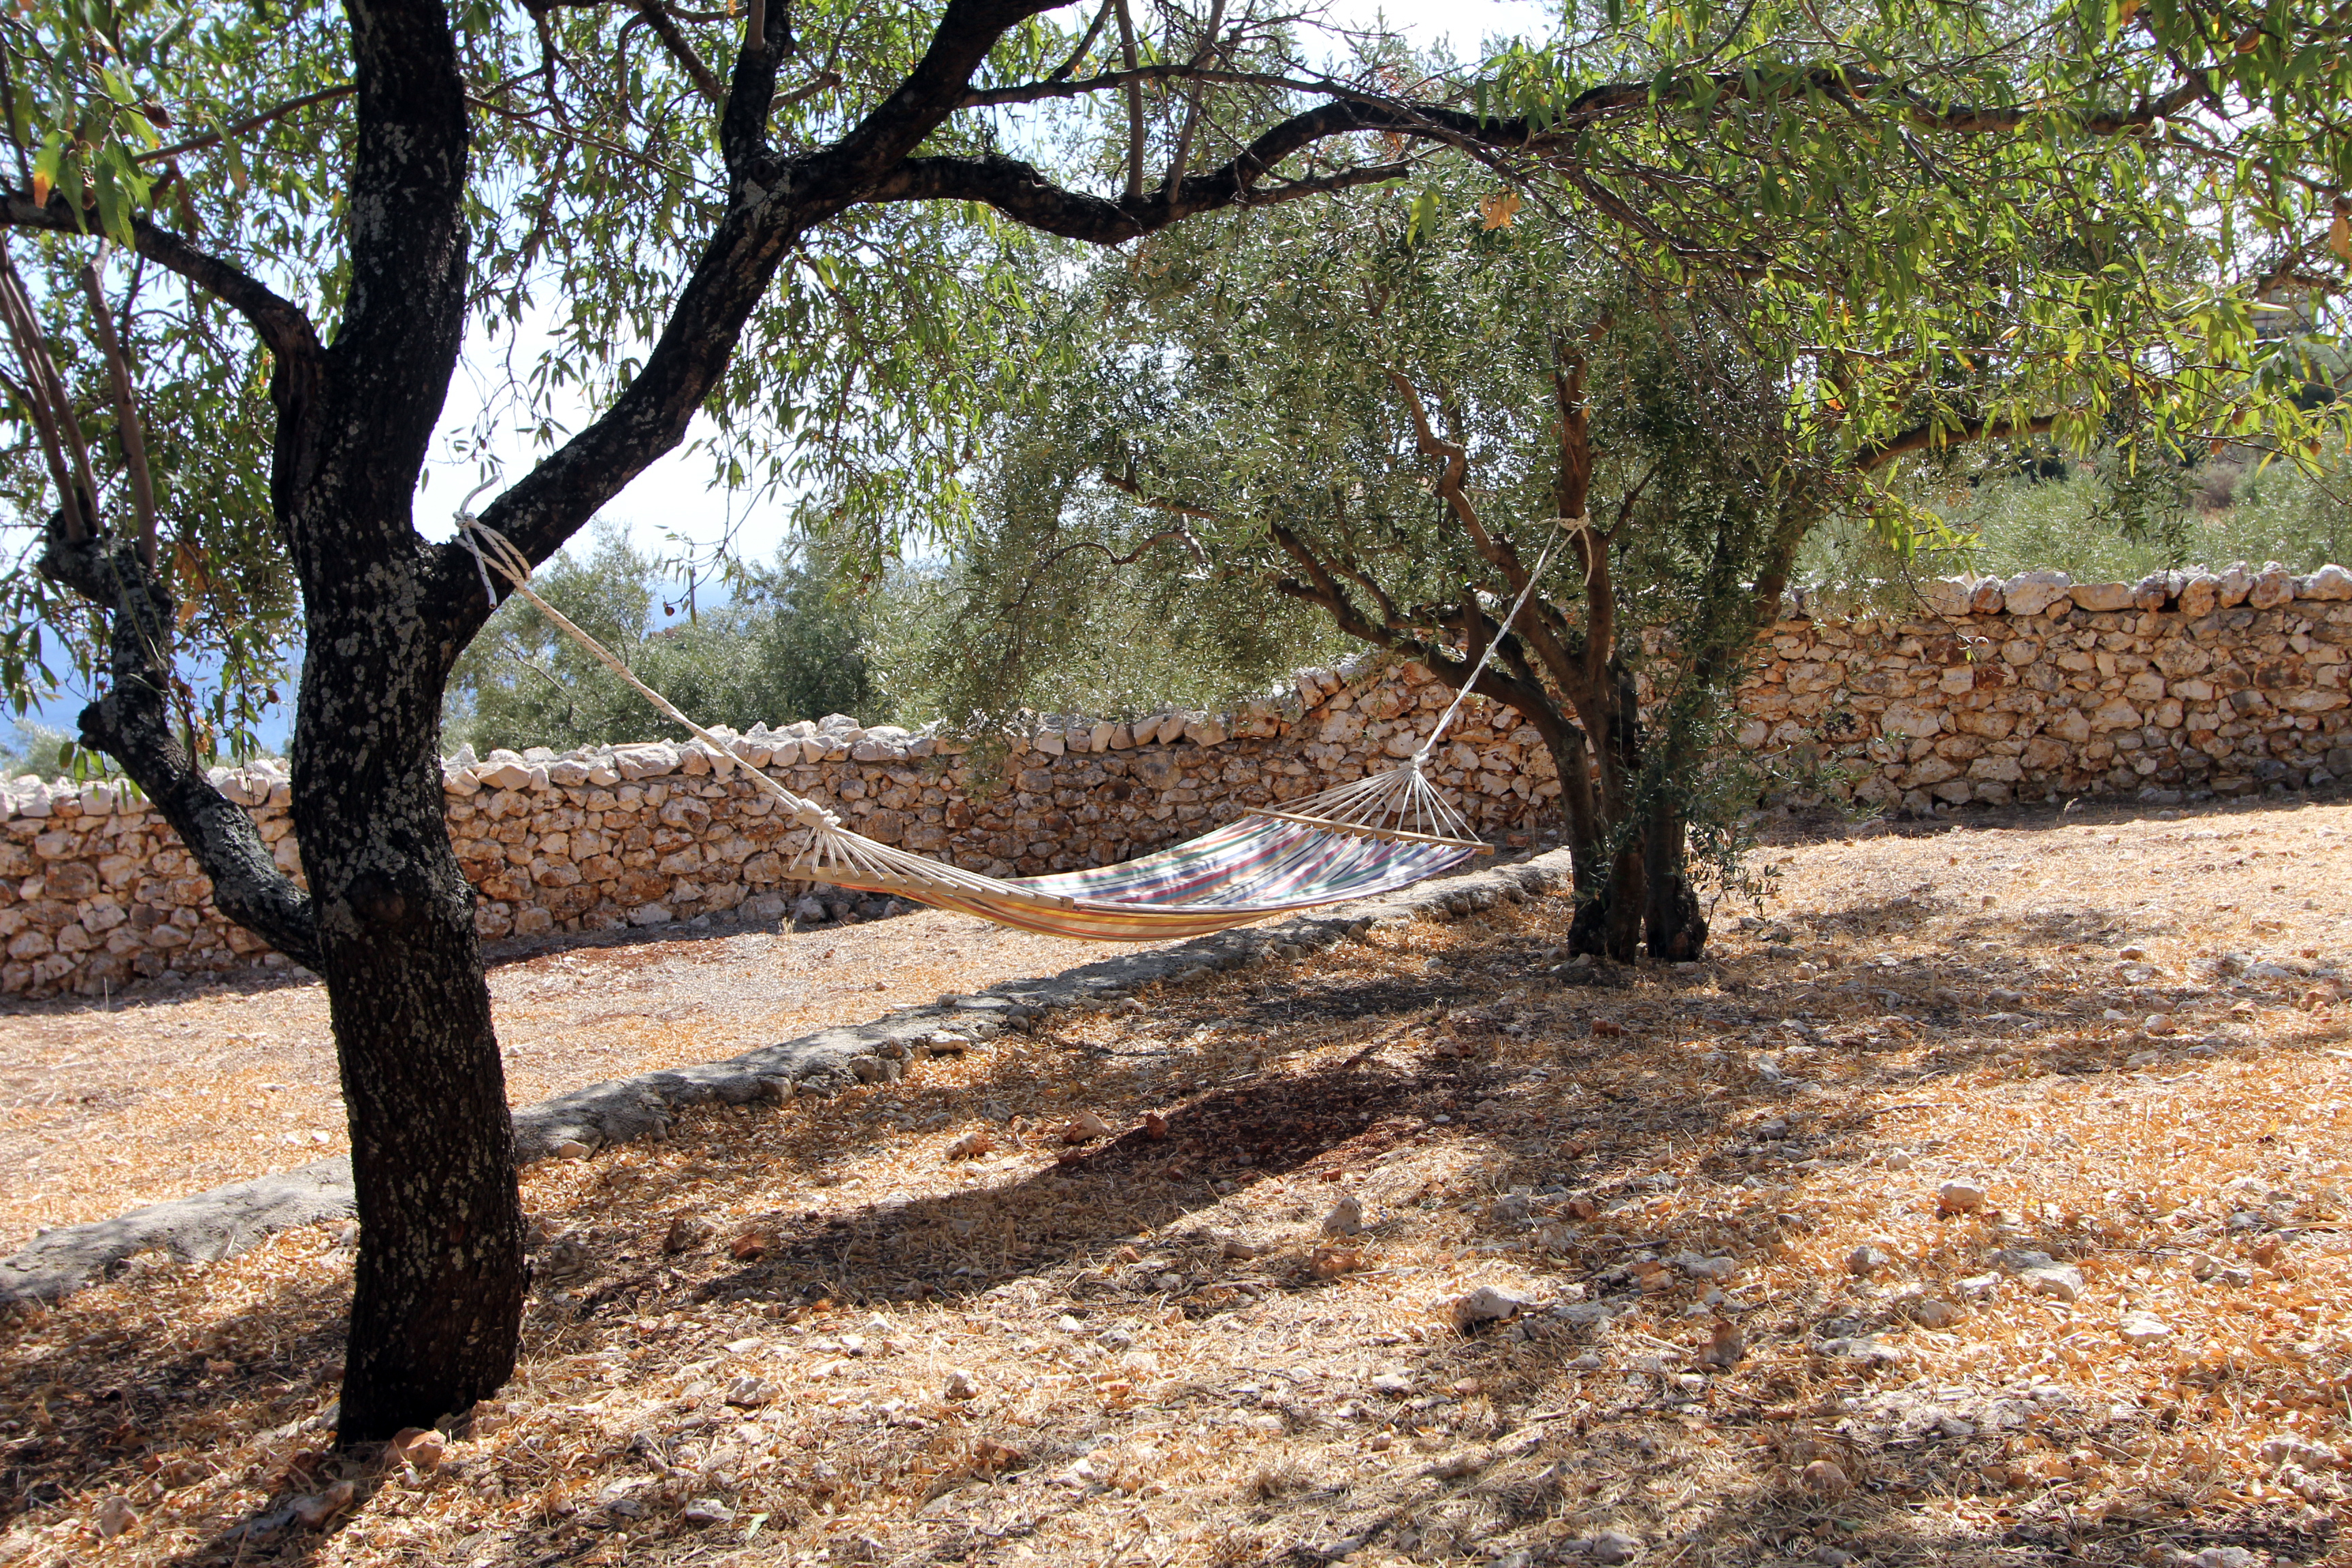 Hammock Relaxation Area